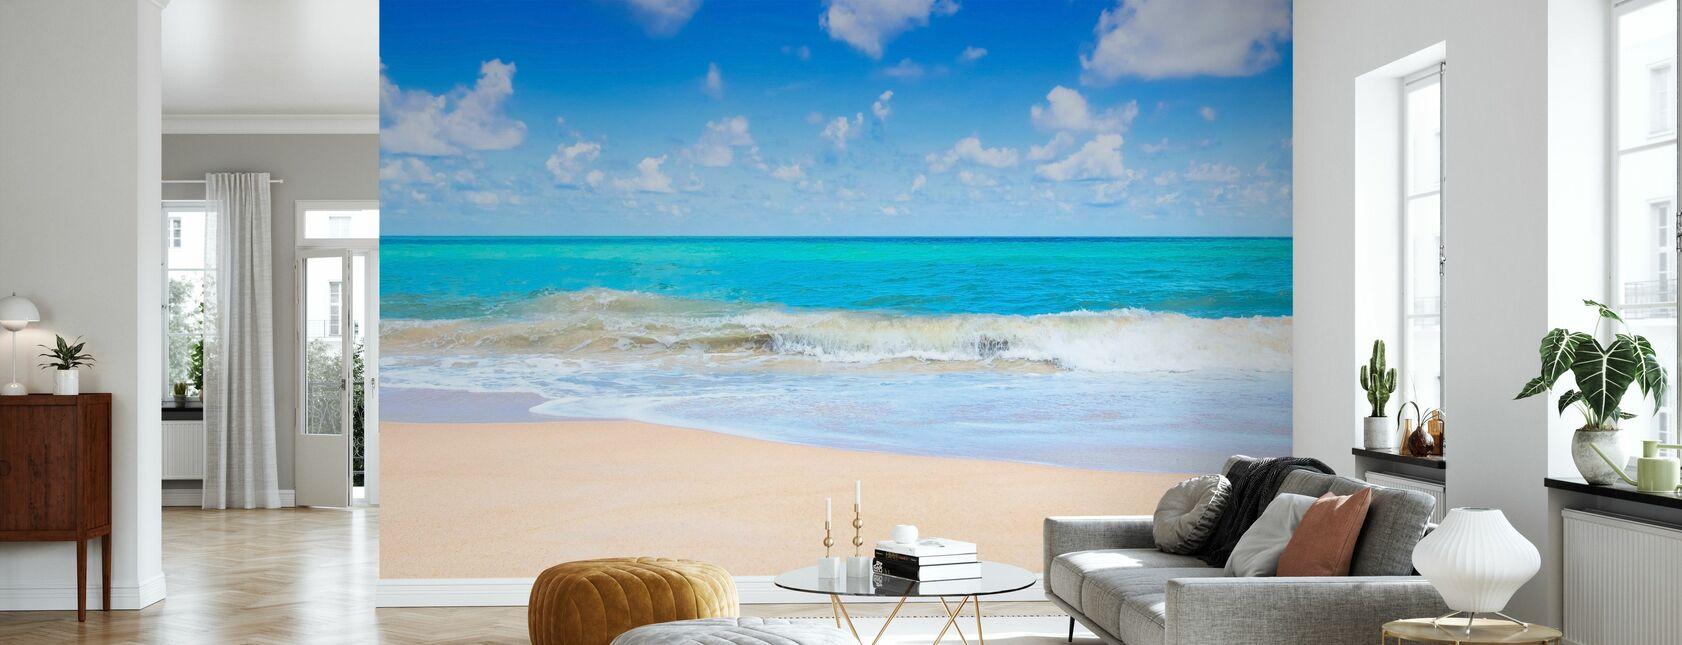 Andaman Sea - Wallpaper - Living Room